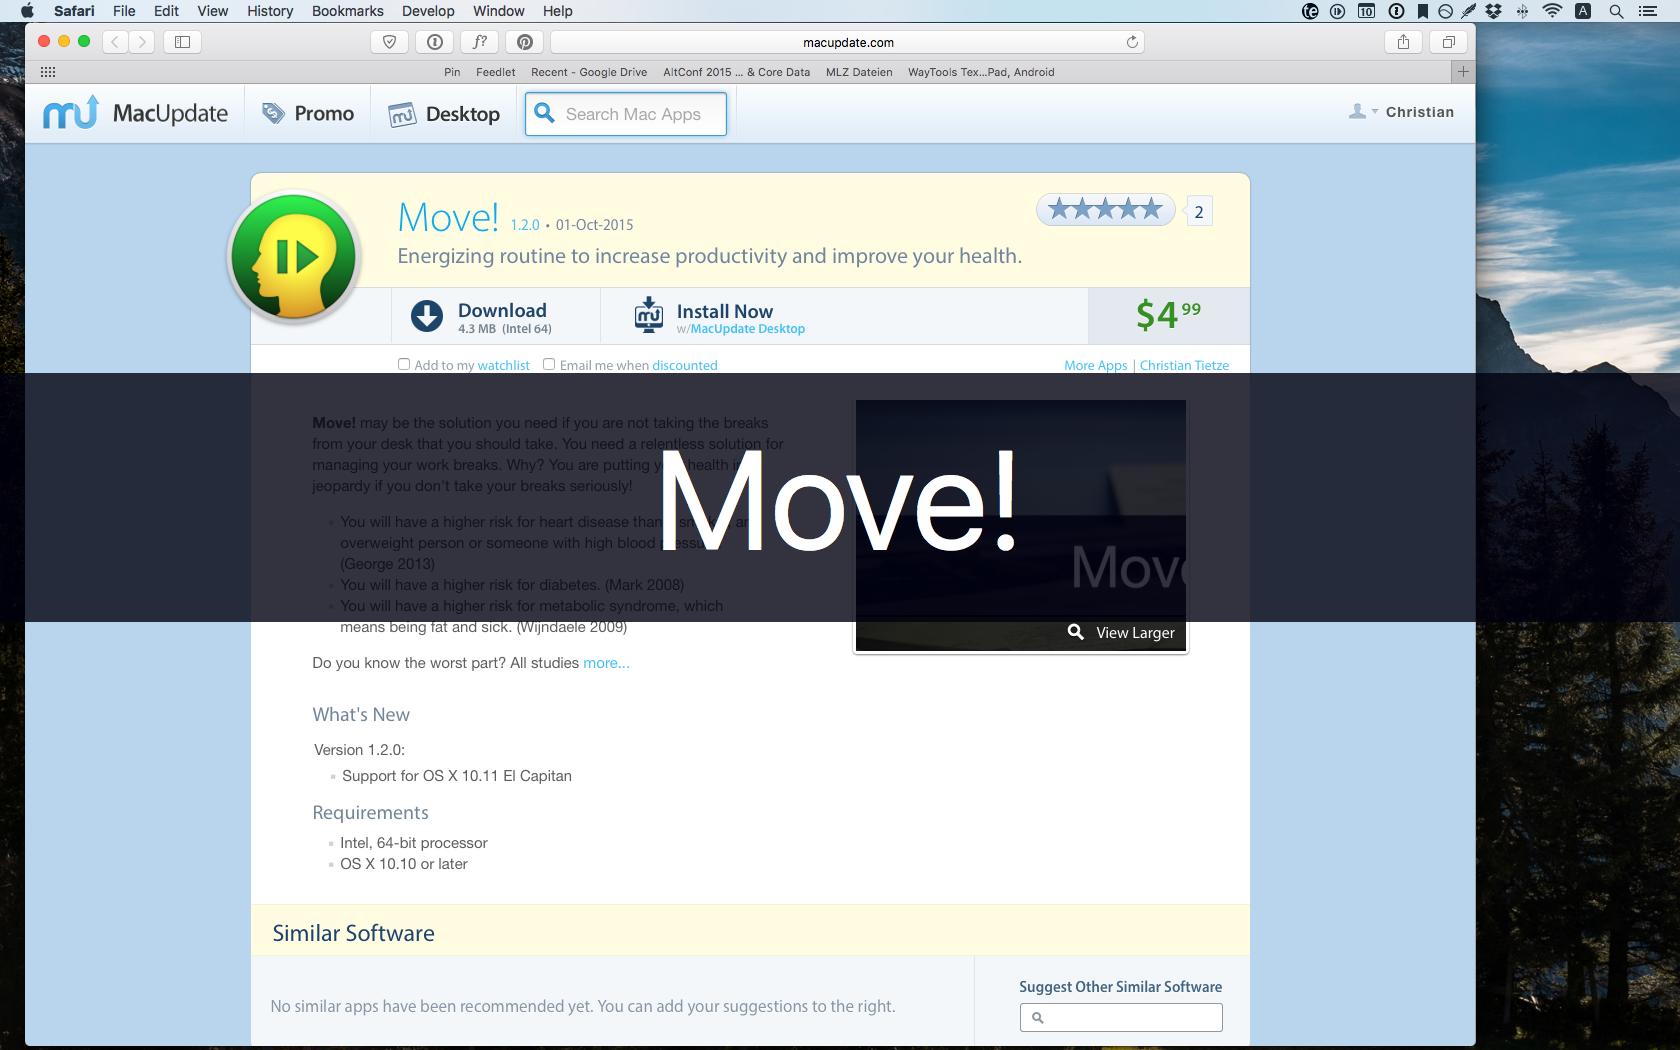 Screenshot of Moive!